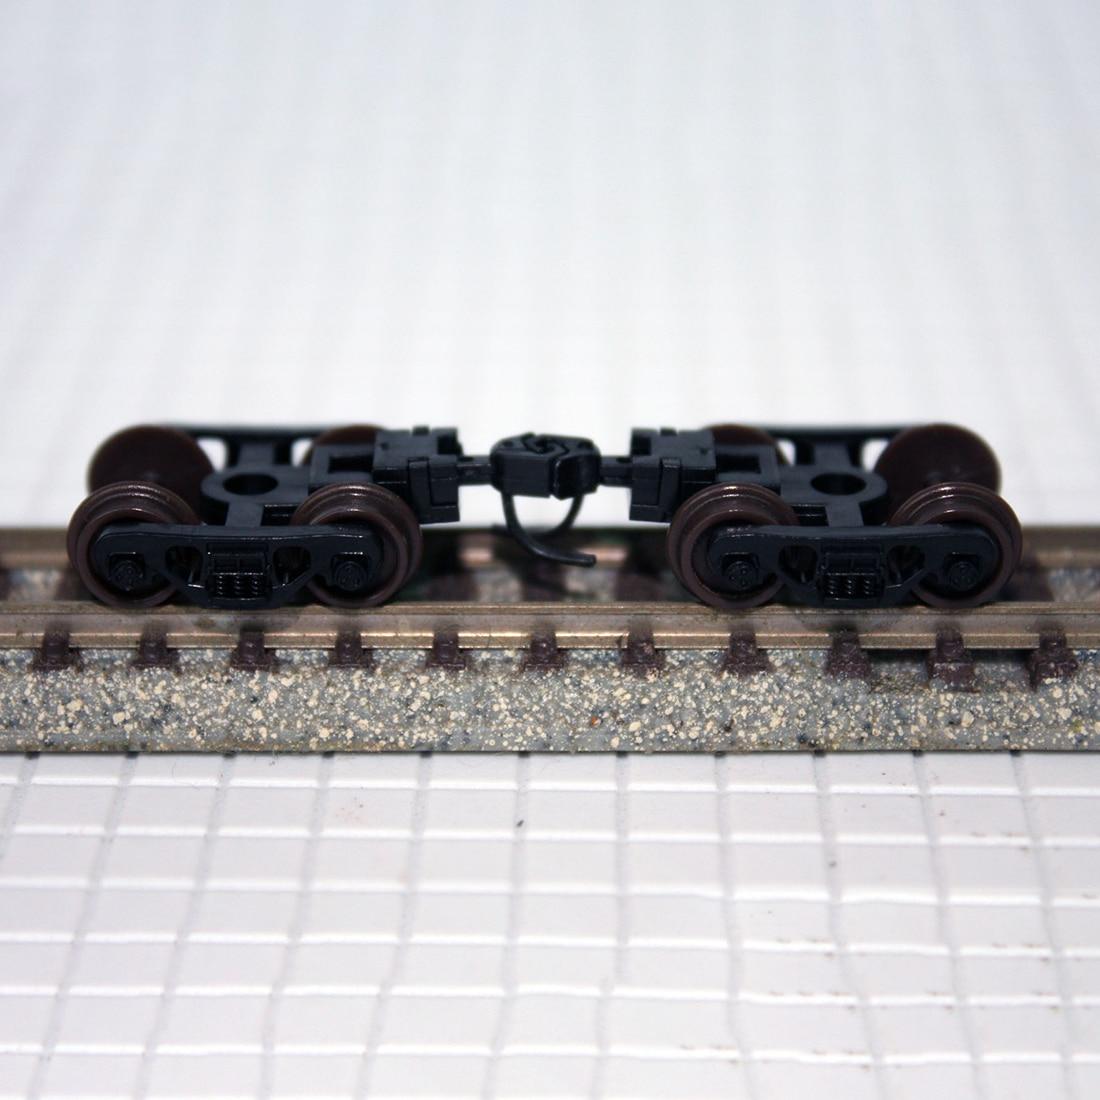 1:160 Train Bogie Model Train Wheel Bogie Set For N-scale Train Model For Bachmann Model Building Kit 2019 New Arrival